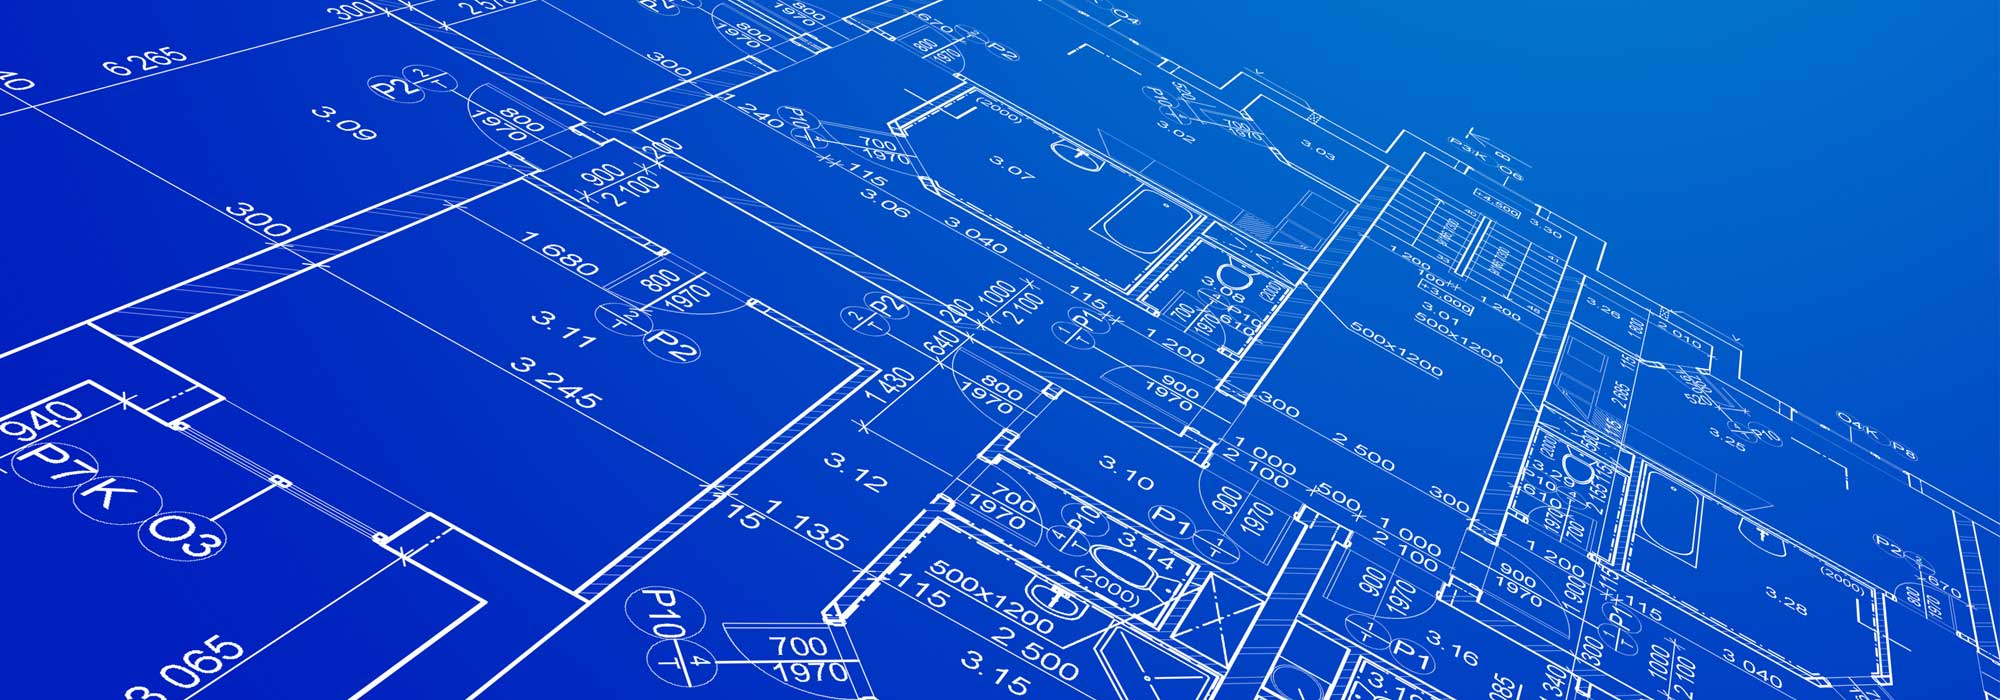 Blueprints Printing | 1800-Printing